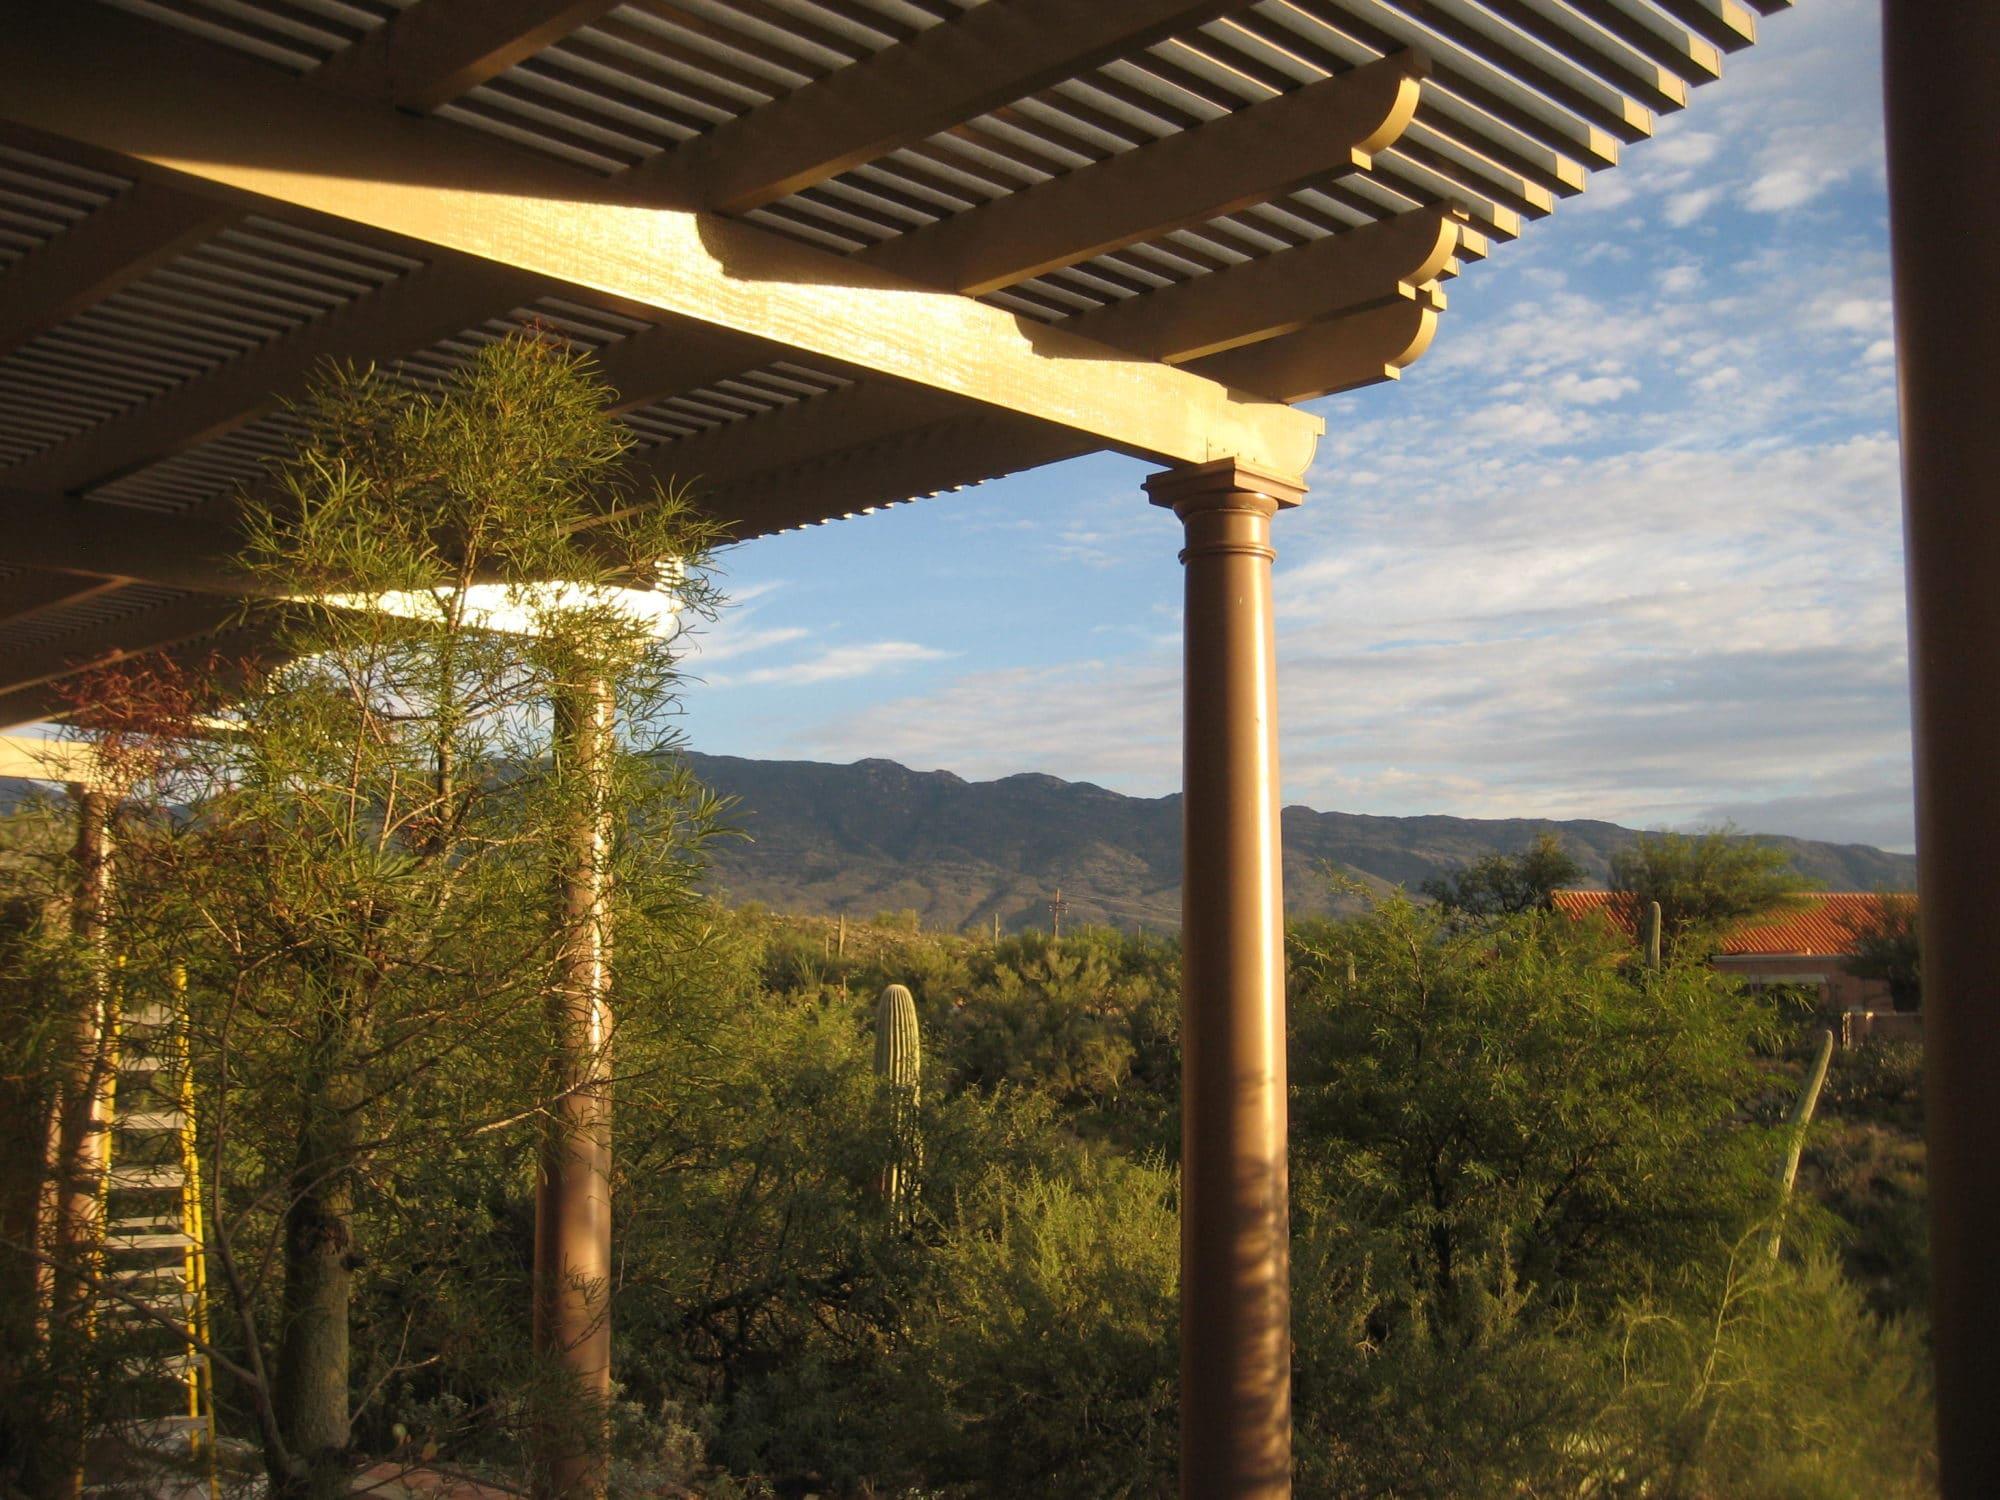 Redington Residence Canopies Amp Awnings Antech Corporation